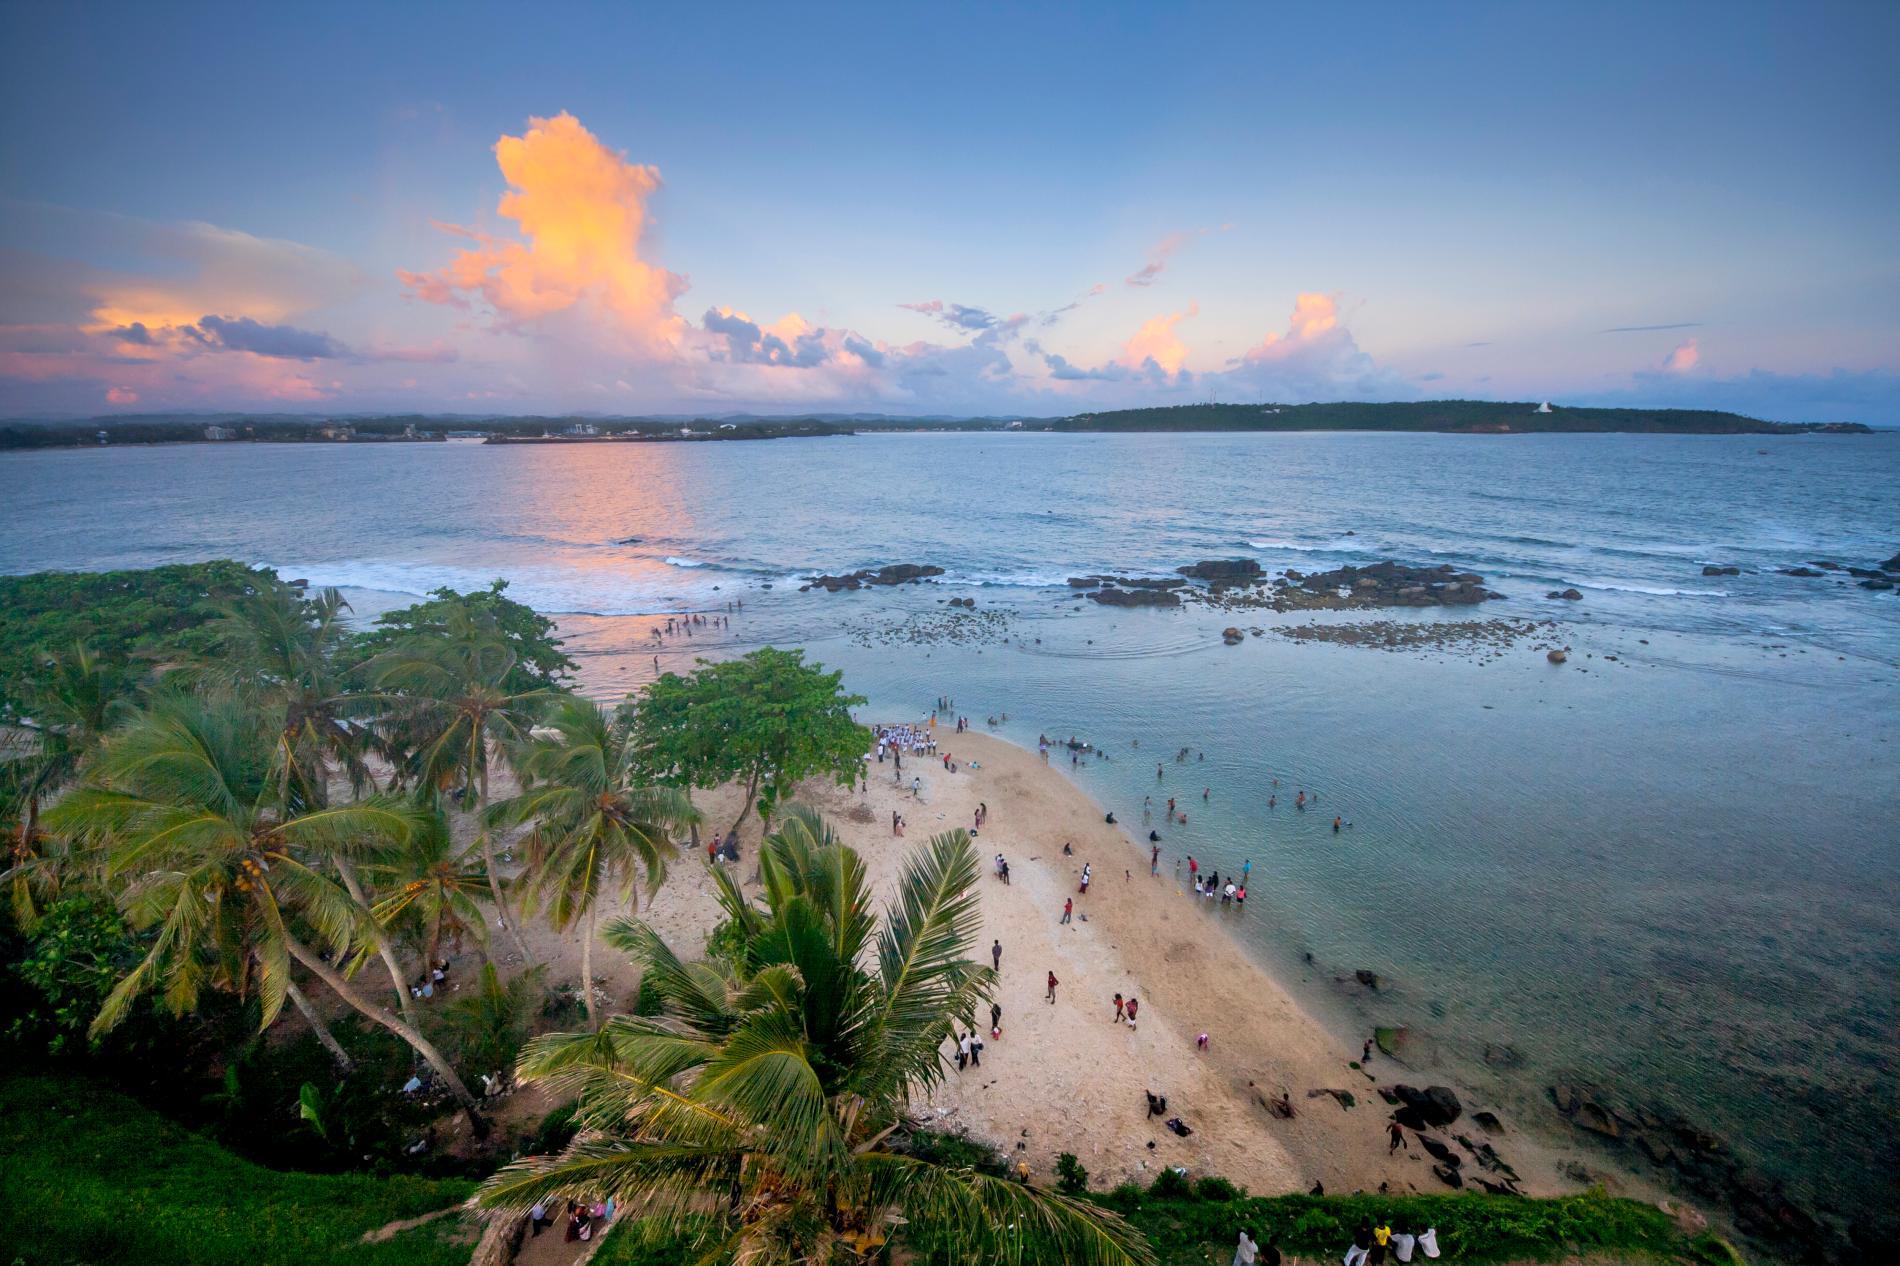 Beachgoers enjoy the coast beneath the Galle Fort on the southwestern coast of Sri Lanka.